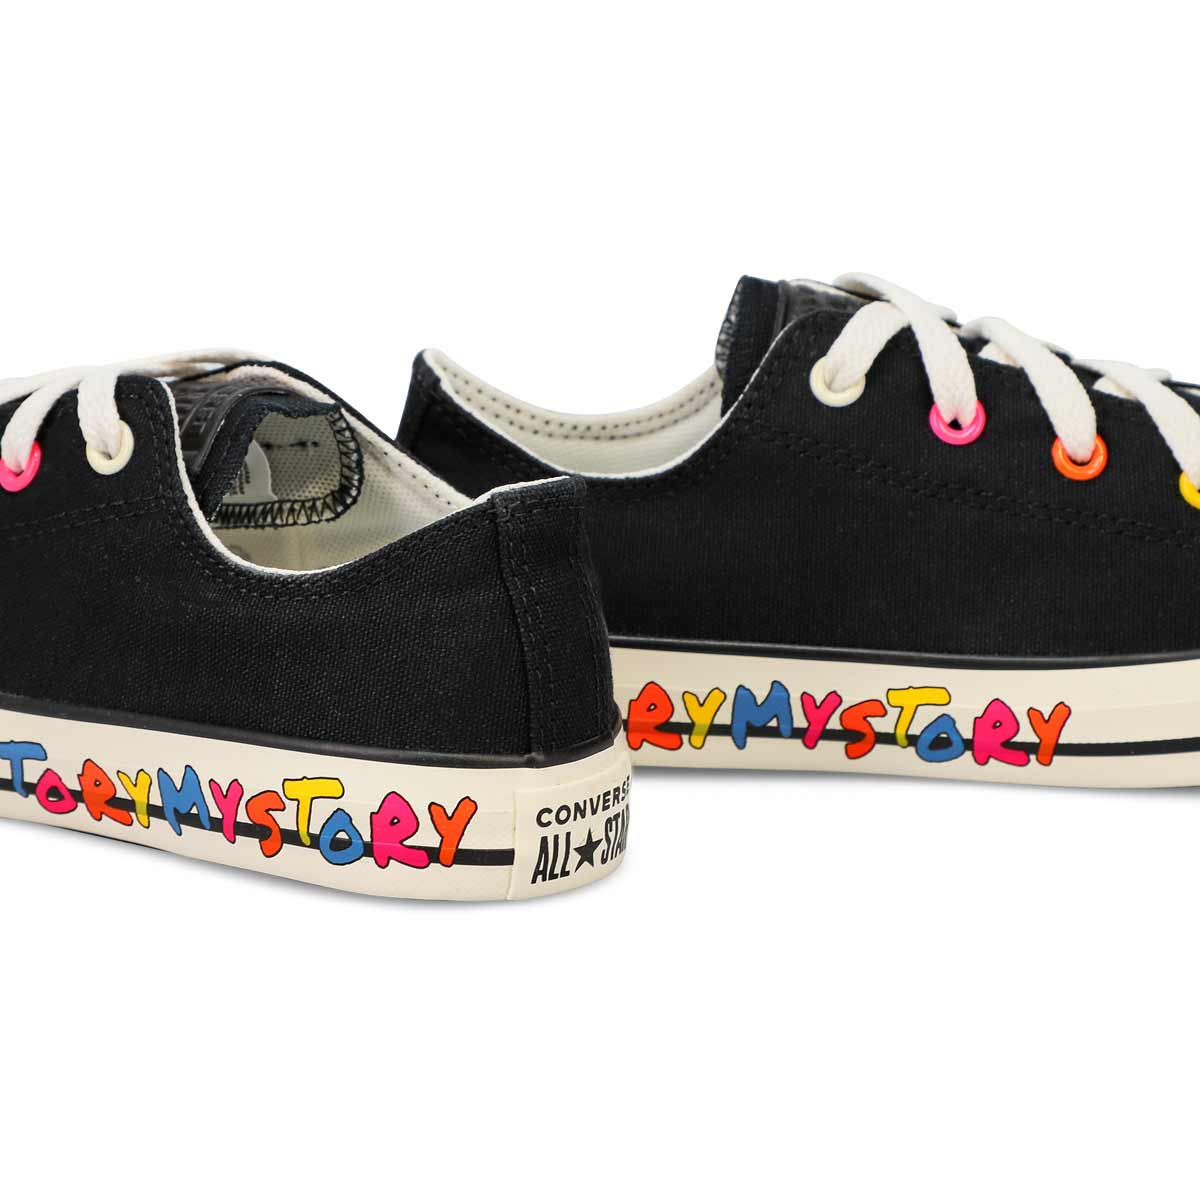 Girls' Chucks Taylor All Star My Story Sneaker